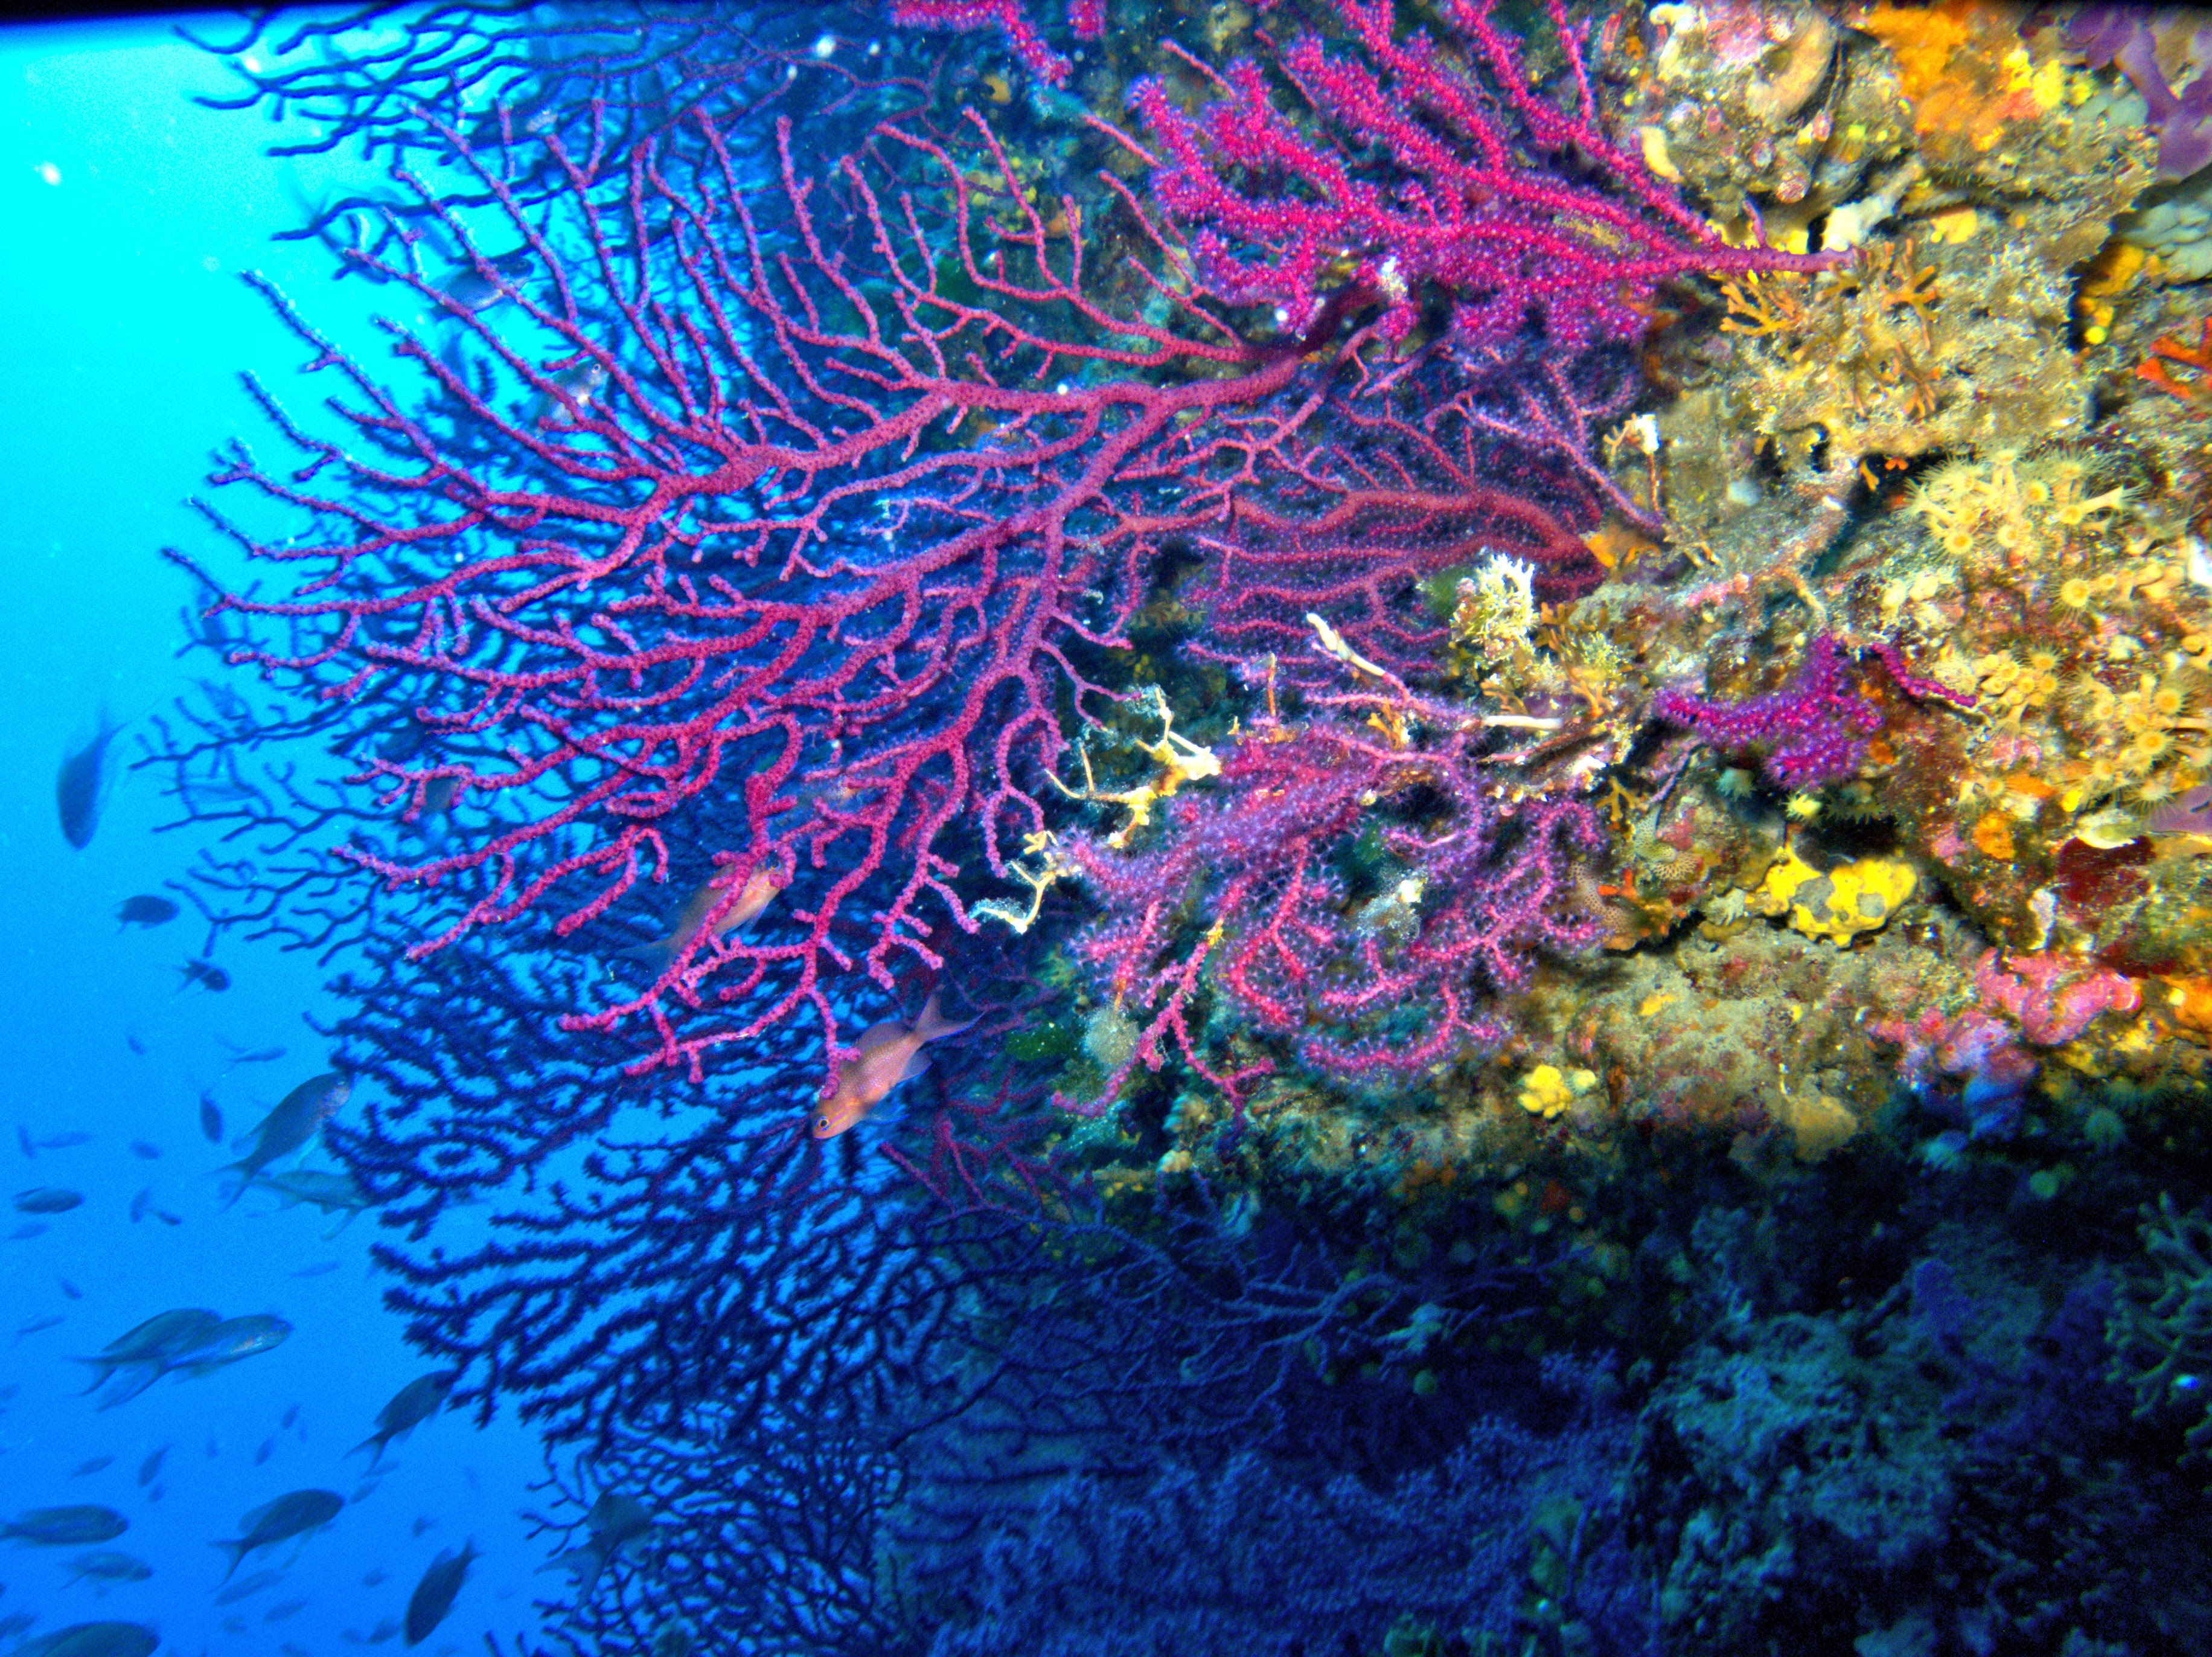 Mediterraneo, mille specie aliene devastano l'equilibrio del nostro mare